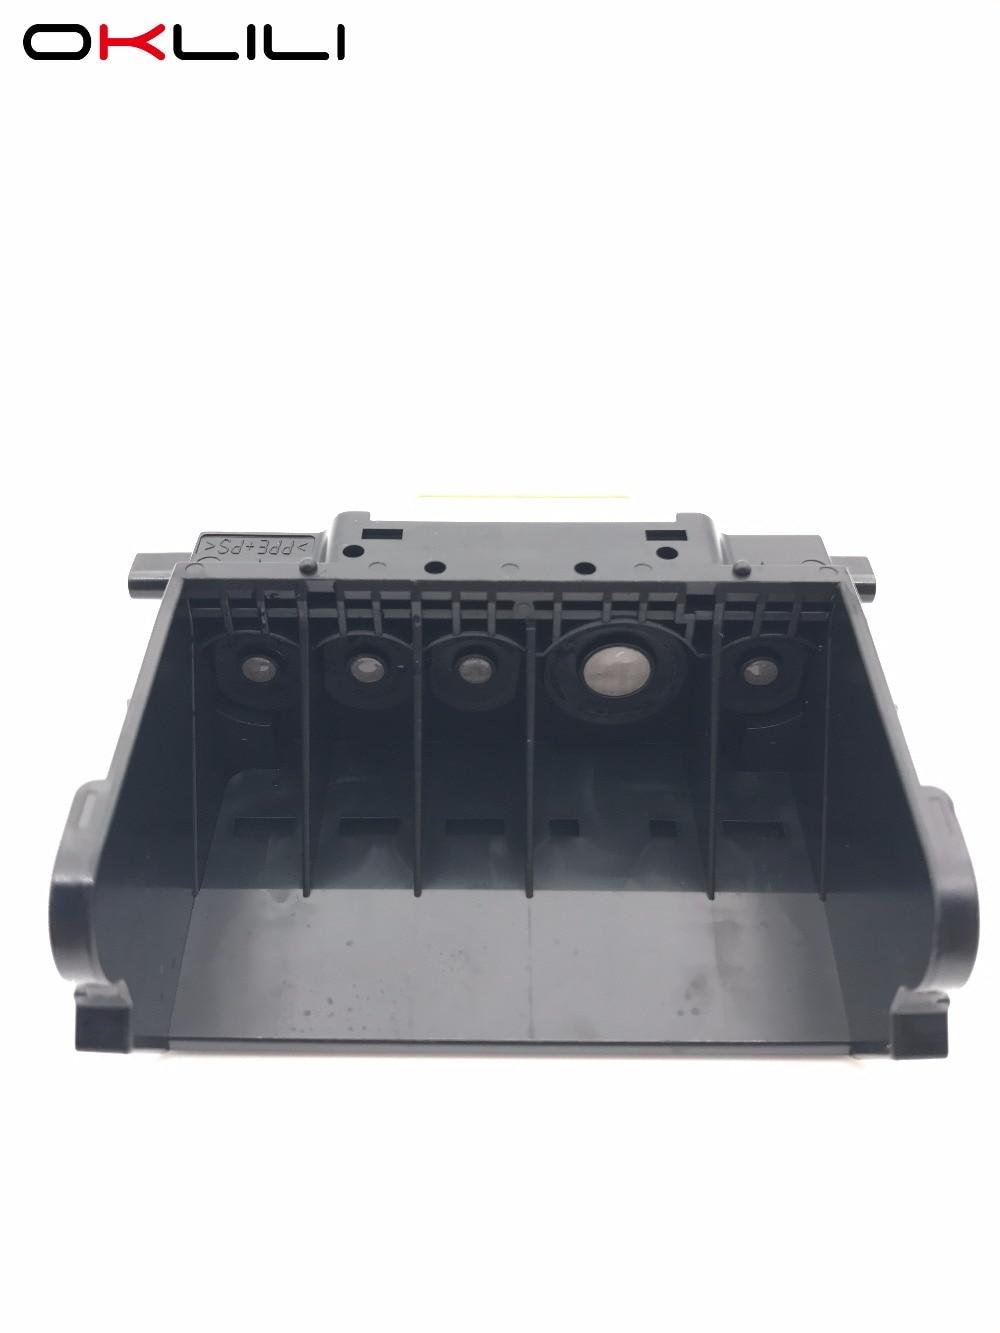 Печатающая головка OKLILI QY6-0061, принтер для Canon iP4300 iP5200 iP5200R MP600 MP600R MP800 MP800R MP830, QY6-0061-000